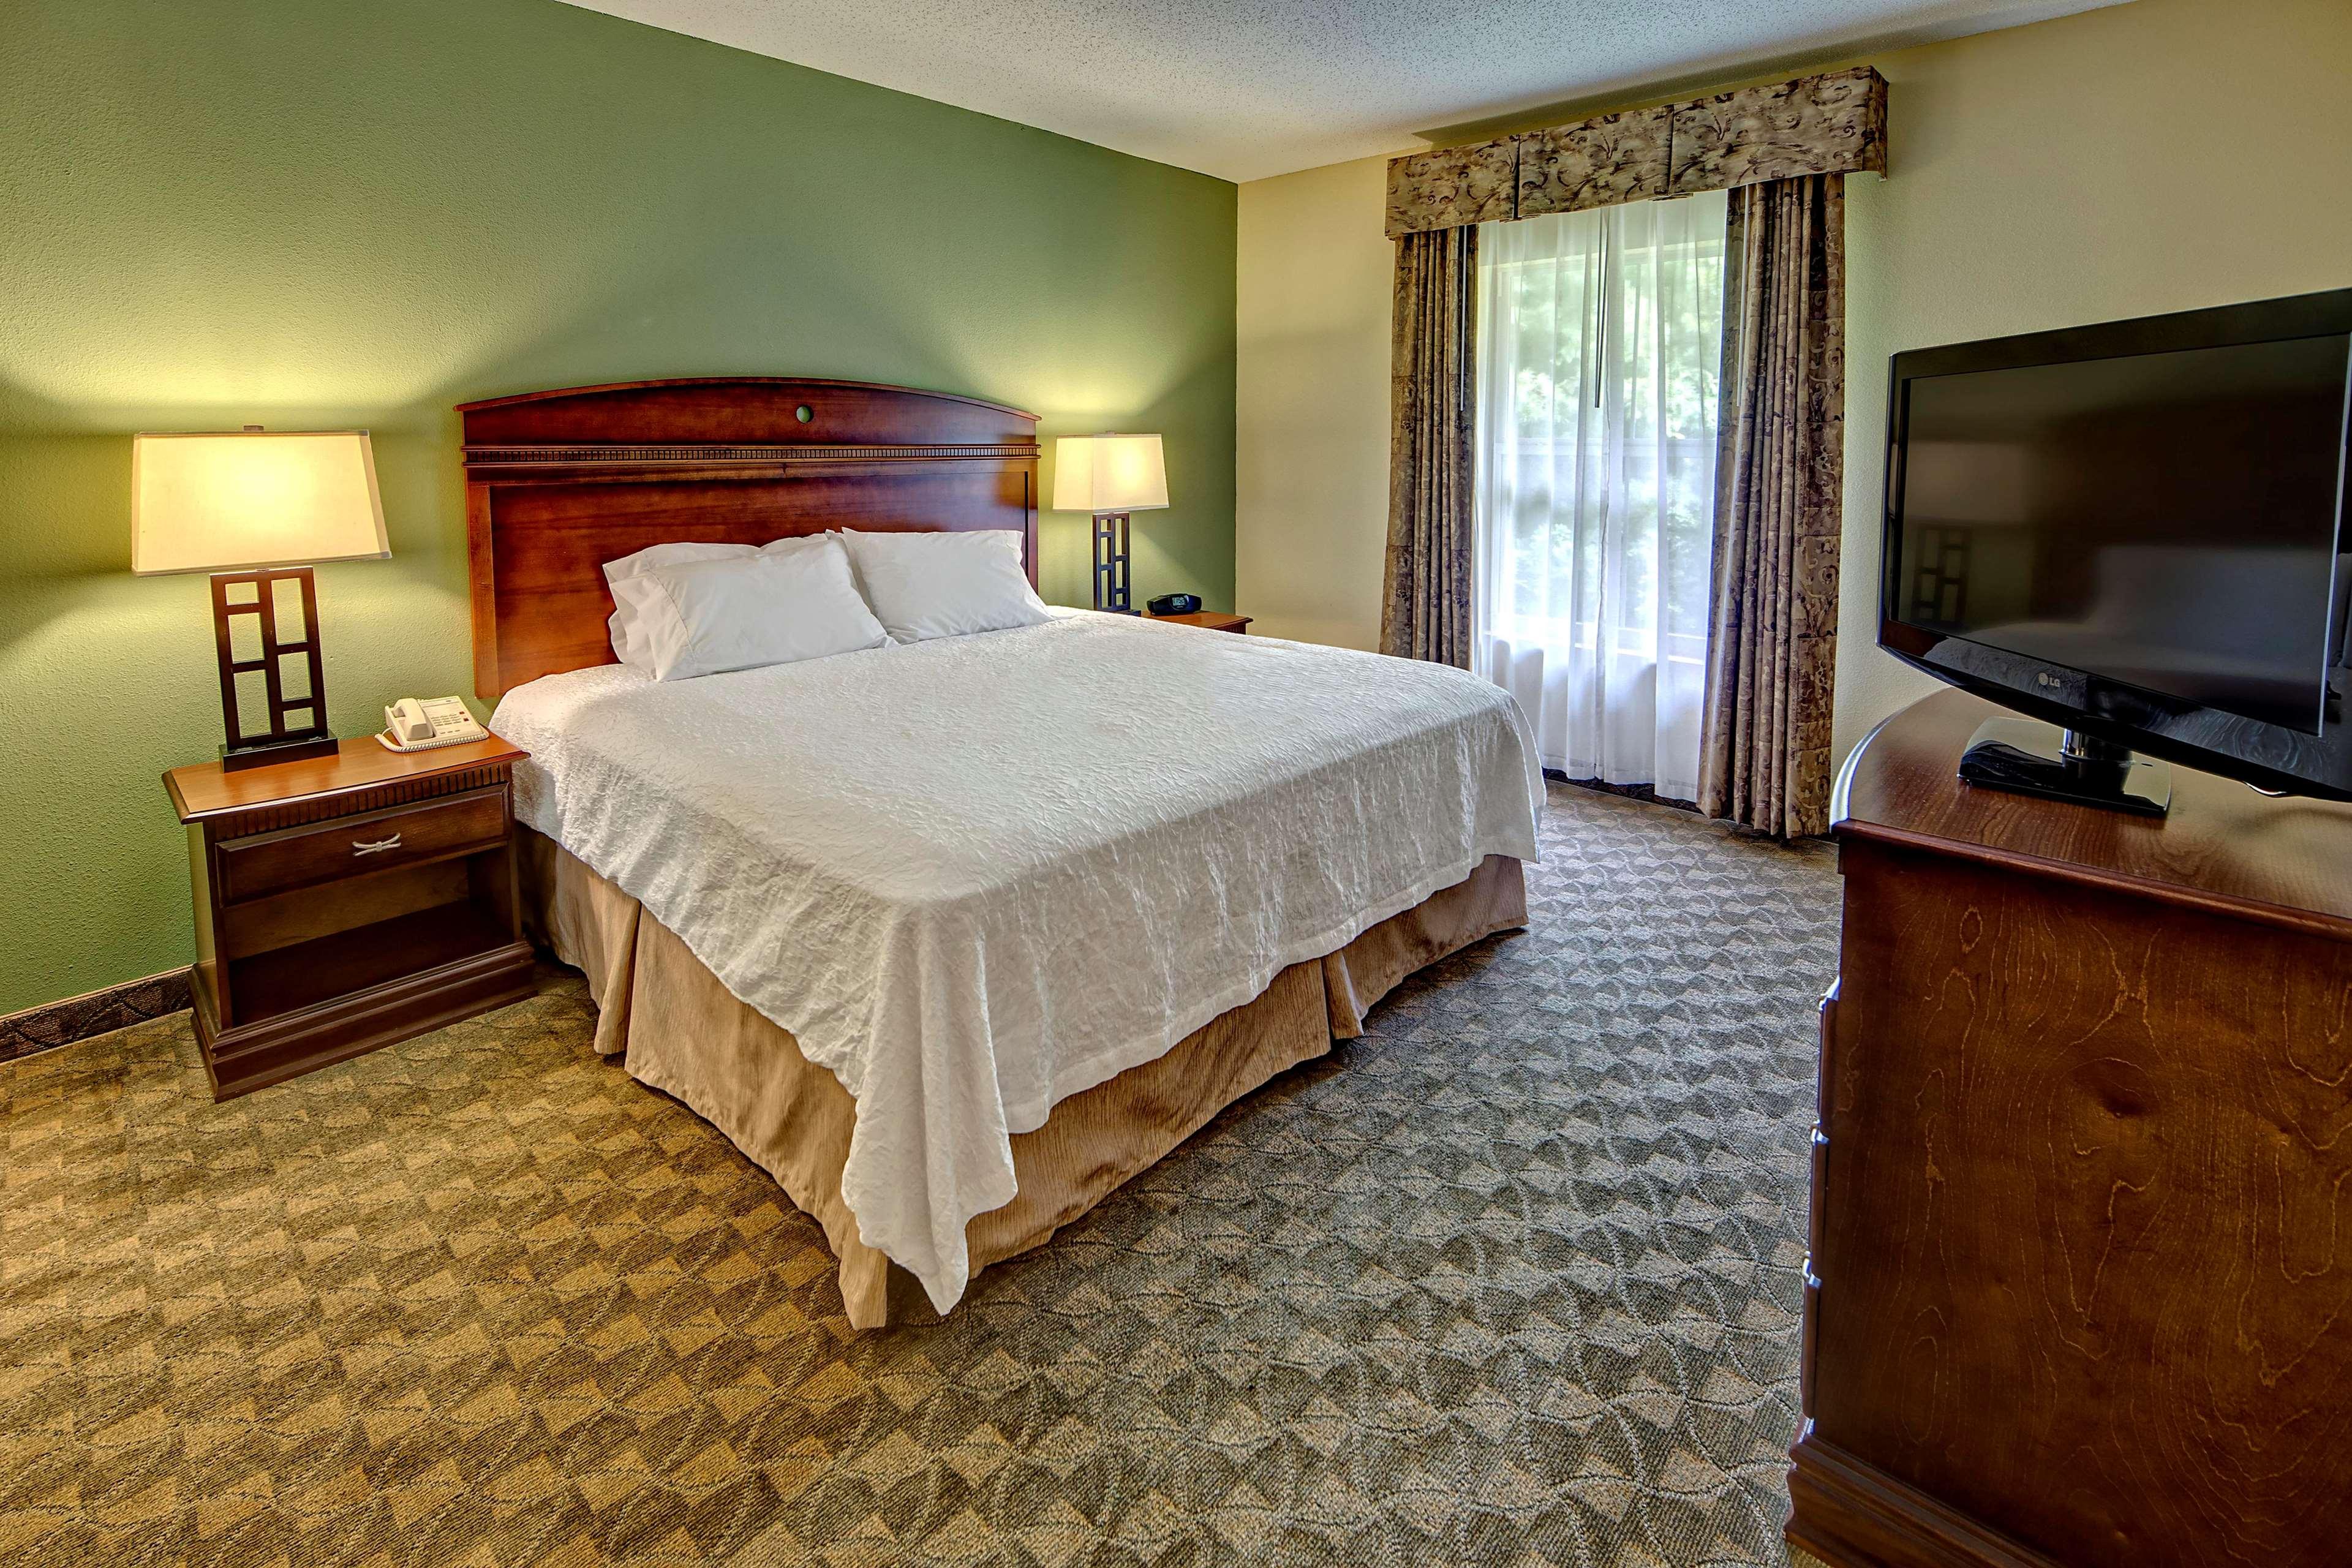 Hampton Inn & Suites Cashiers-Sapphire Valley image 36